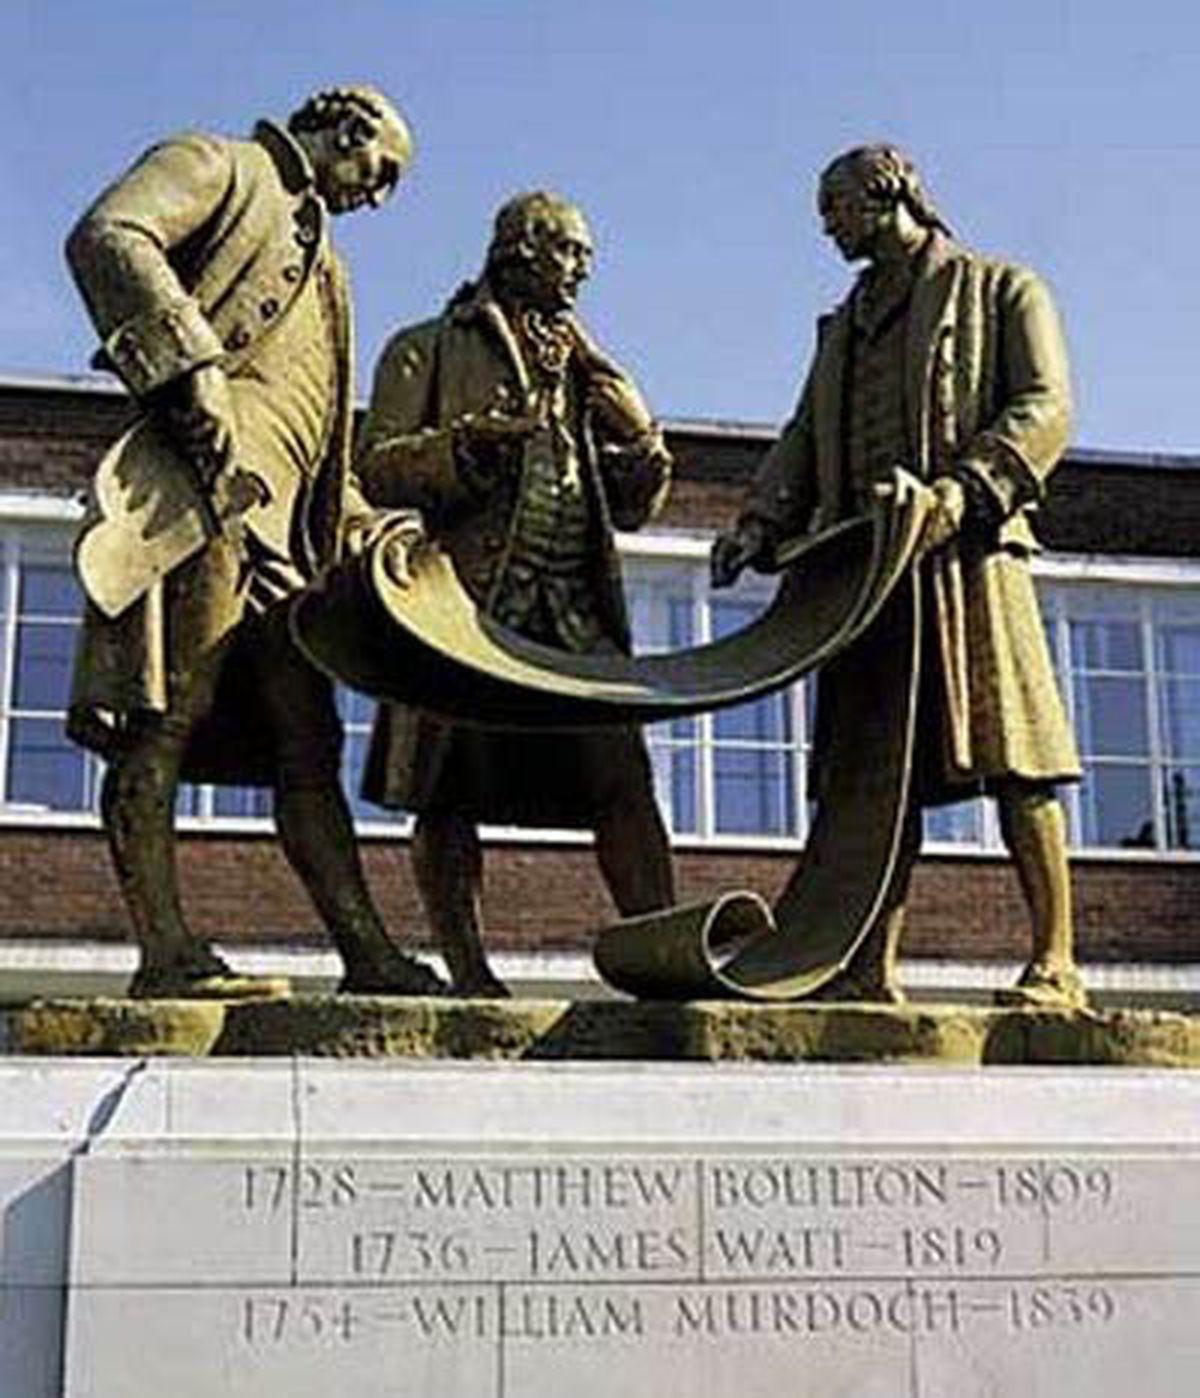 Birmingham's statue of Boulton, Watt and Murdoch